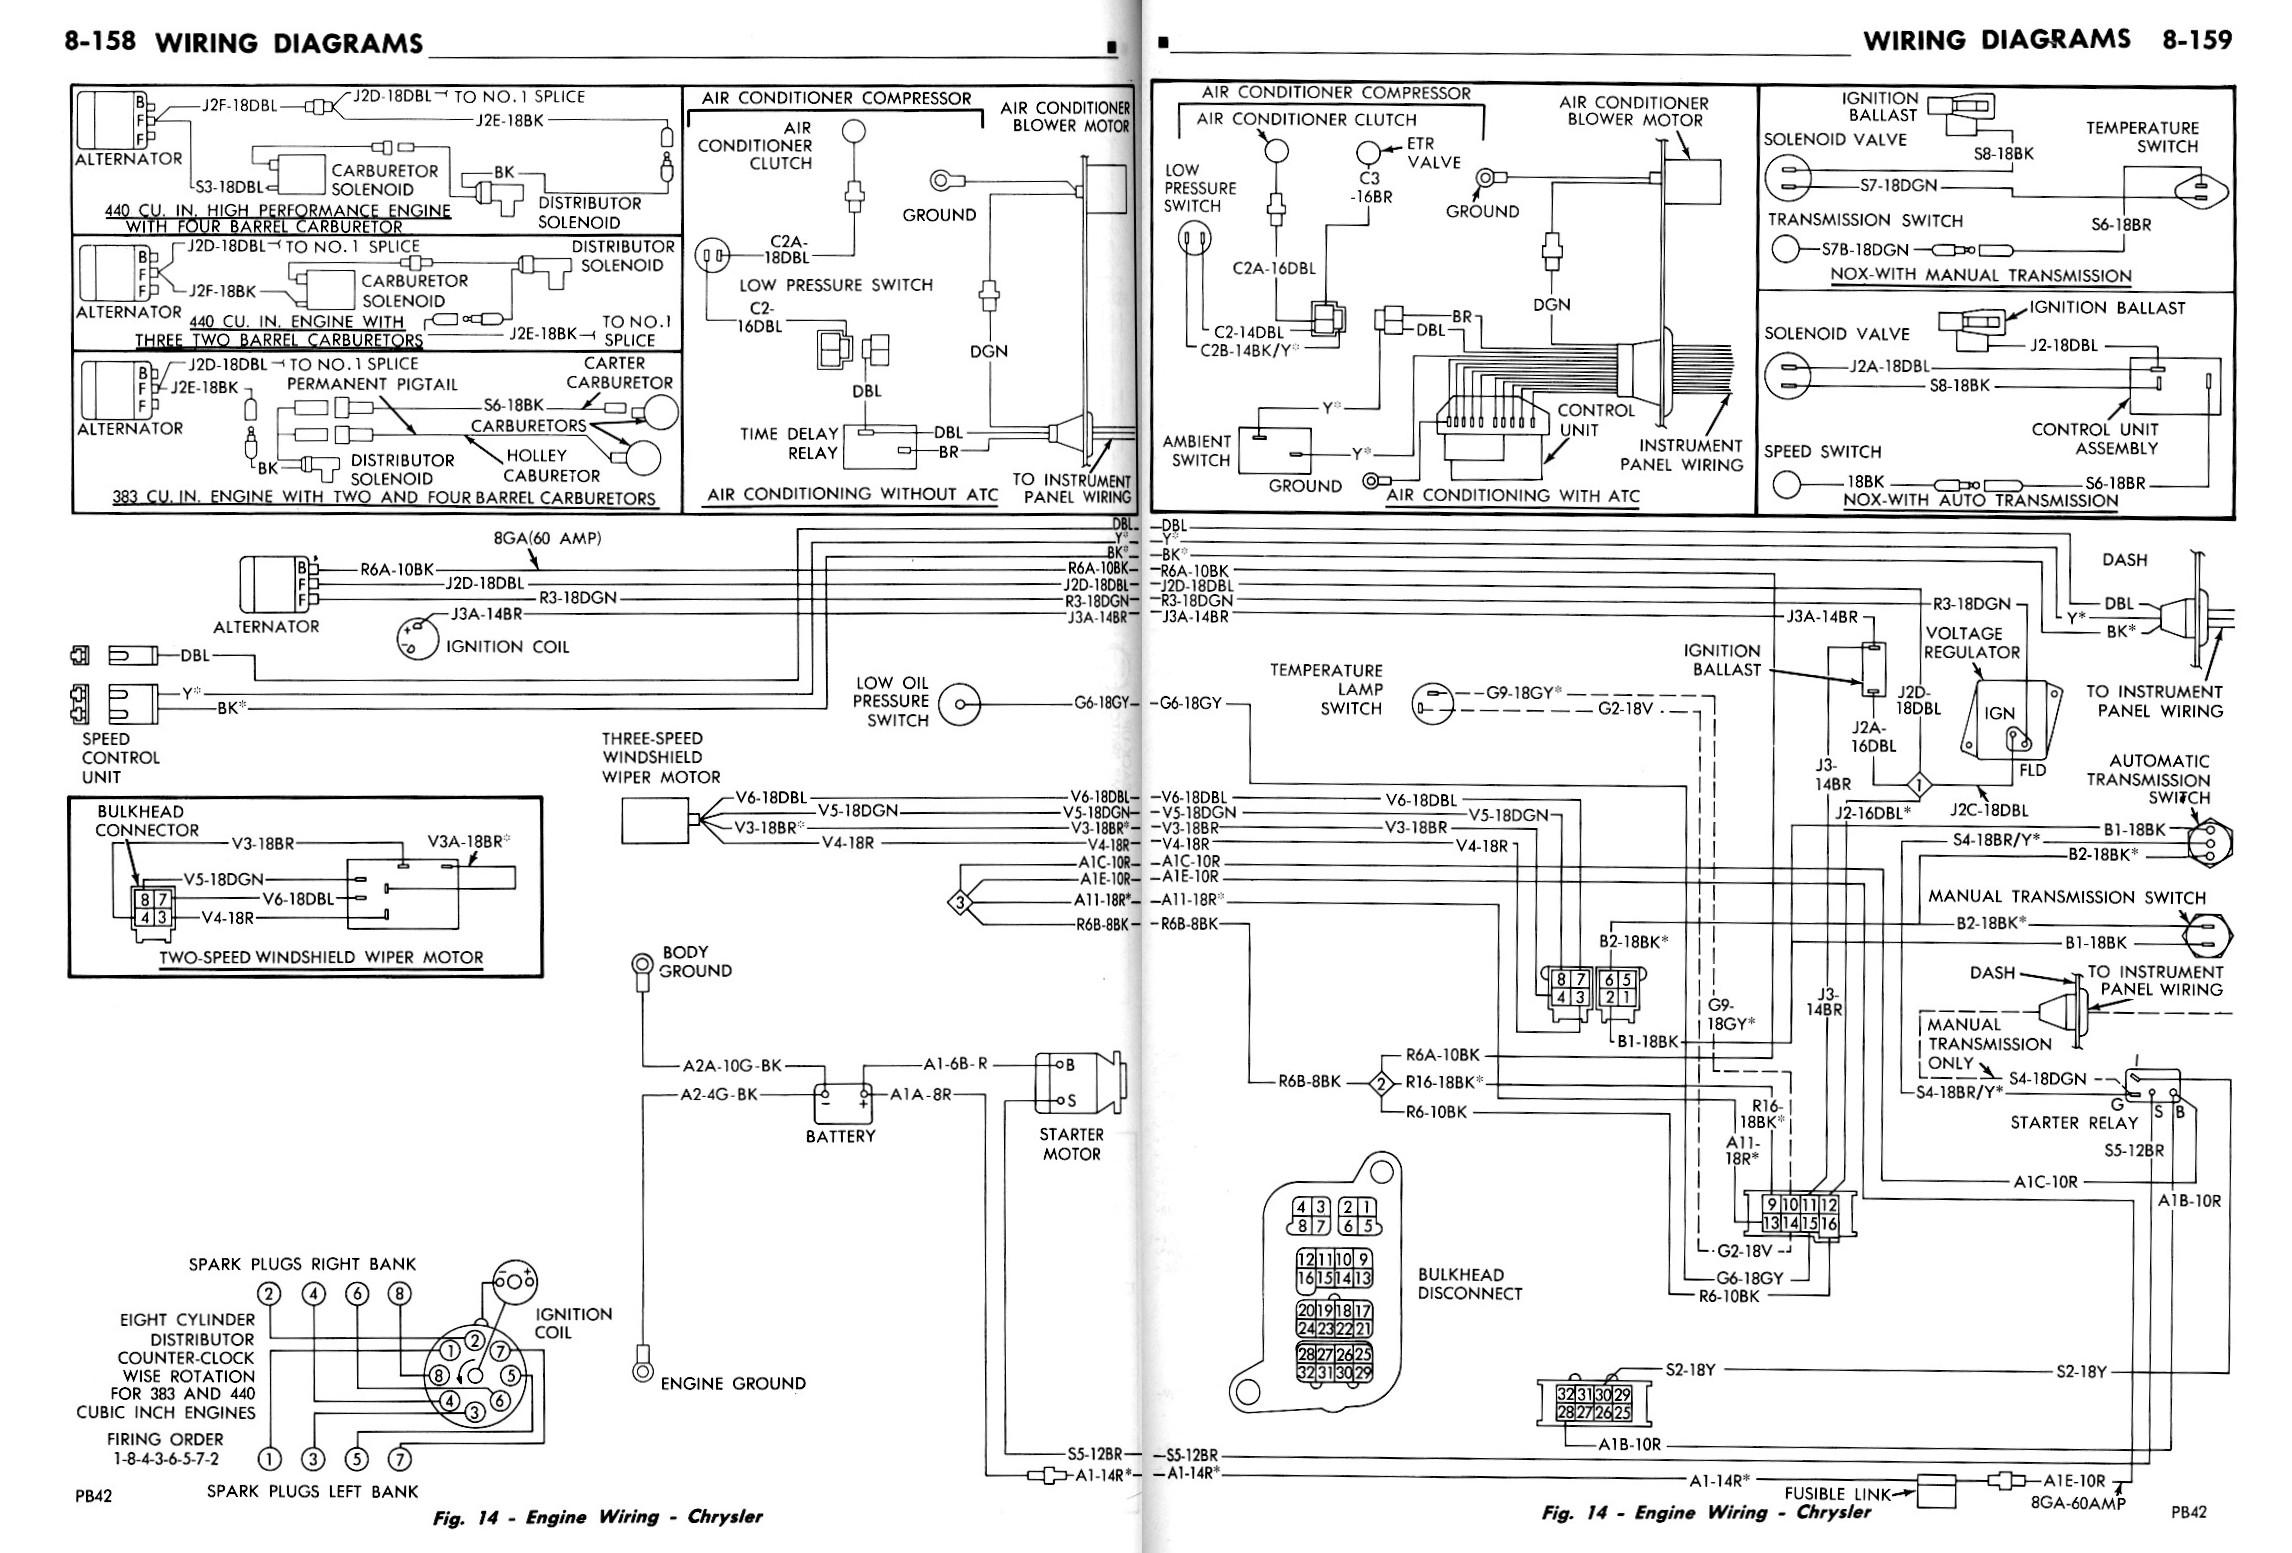 Chrysler Voltage Regulator Wiring Diagram : Internal wiring diagram of chrysler external voltage